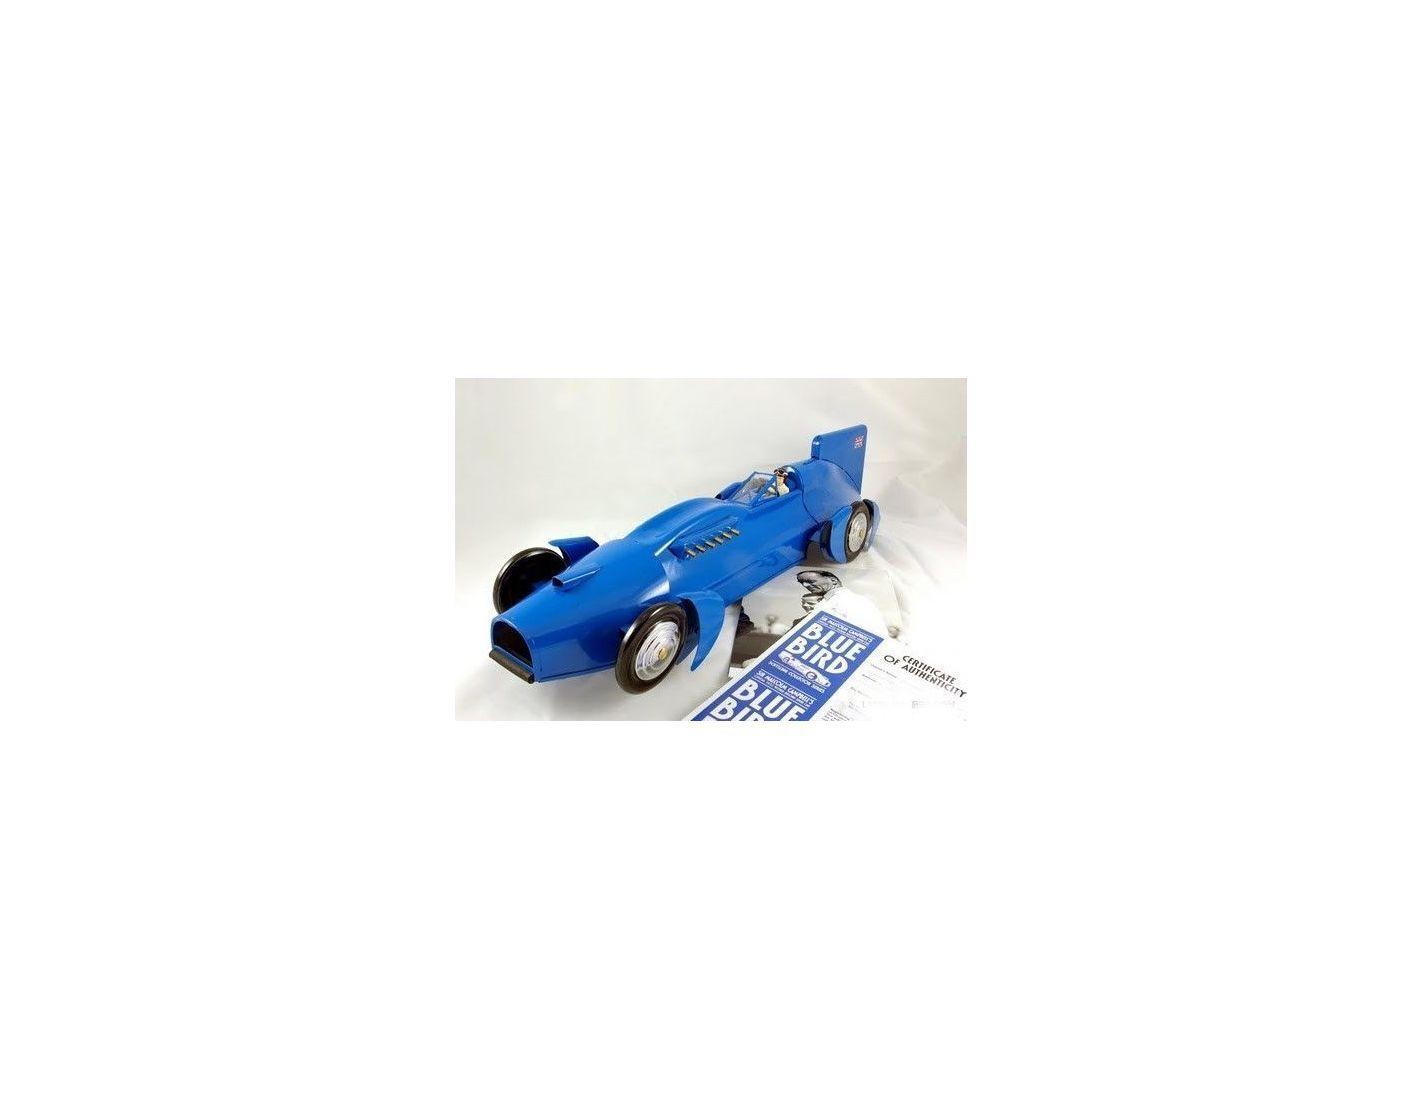 Die Blechfabrik 21733 bleu BIRD 1933 WORLD RECORD  voiture BBC Modellino  détaillant de fitness